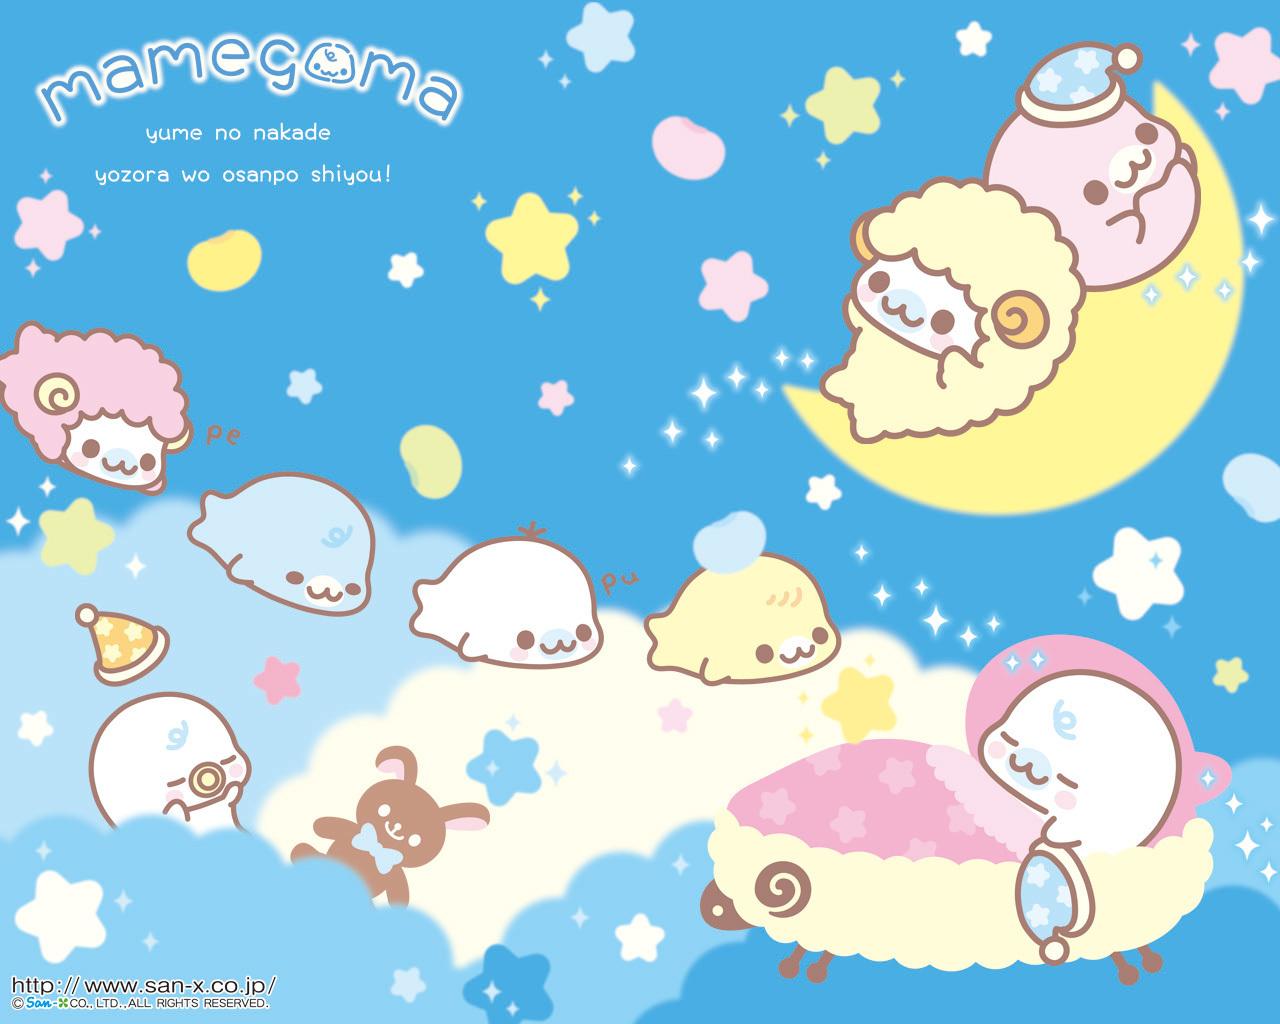 Mamegoma-Baby-Bedtime-Wallpaper-mamegoma